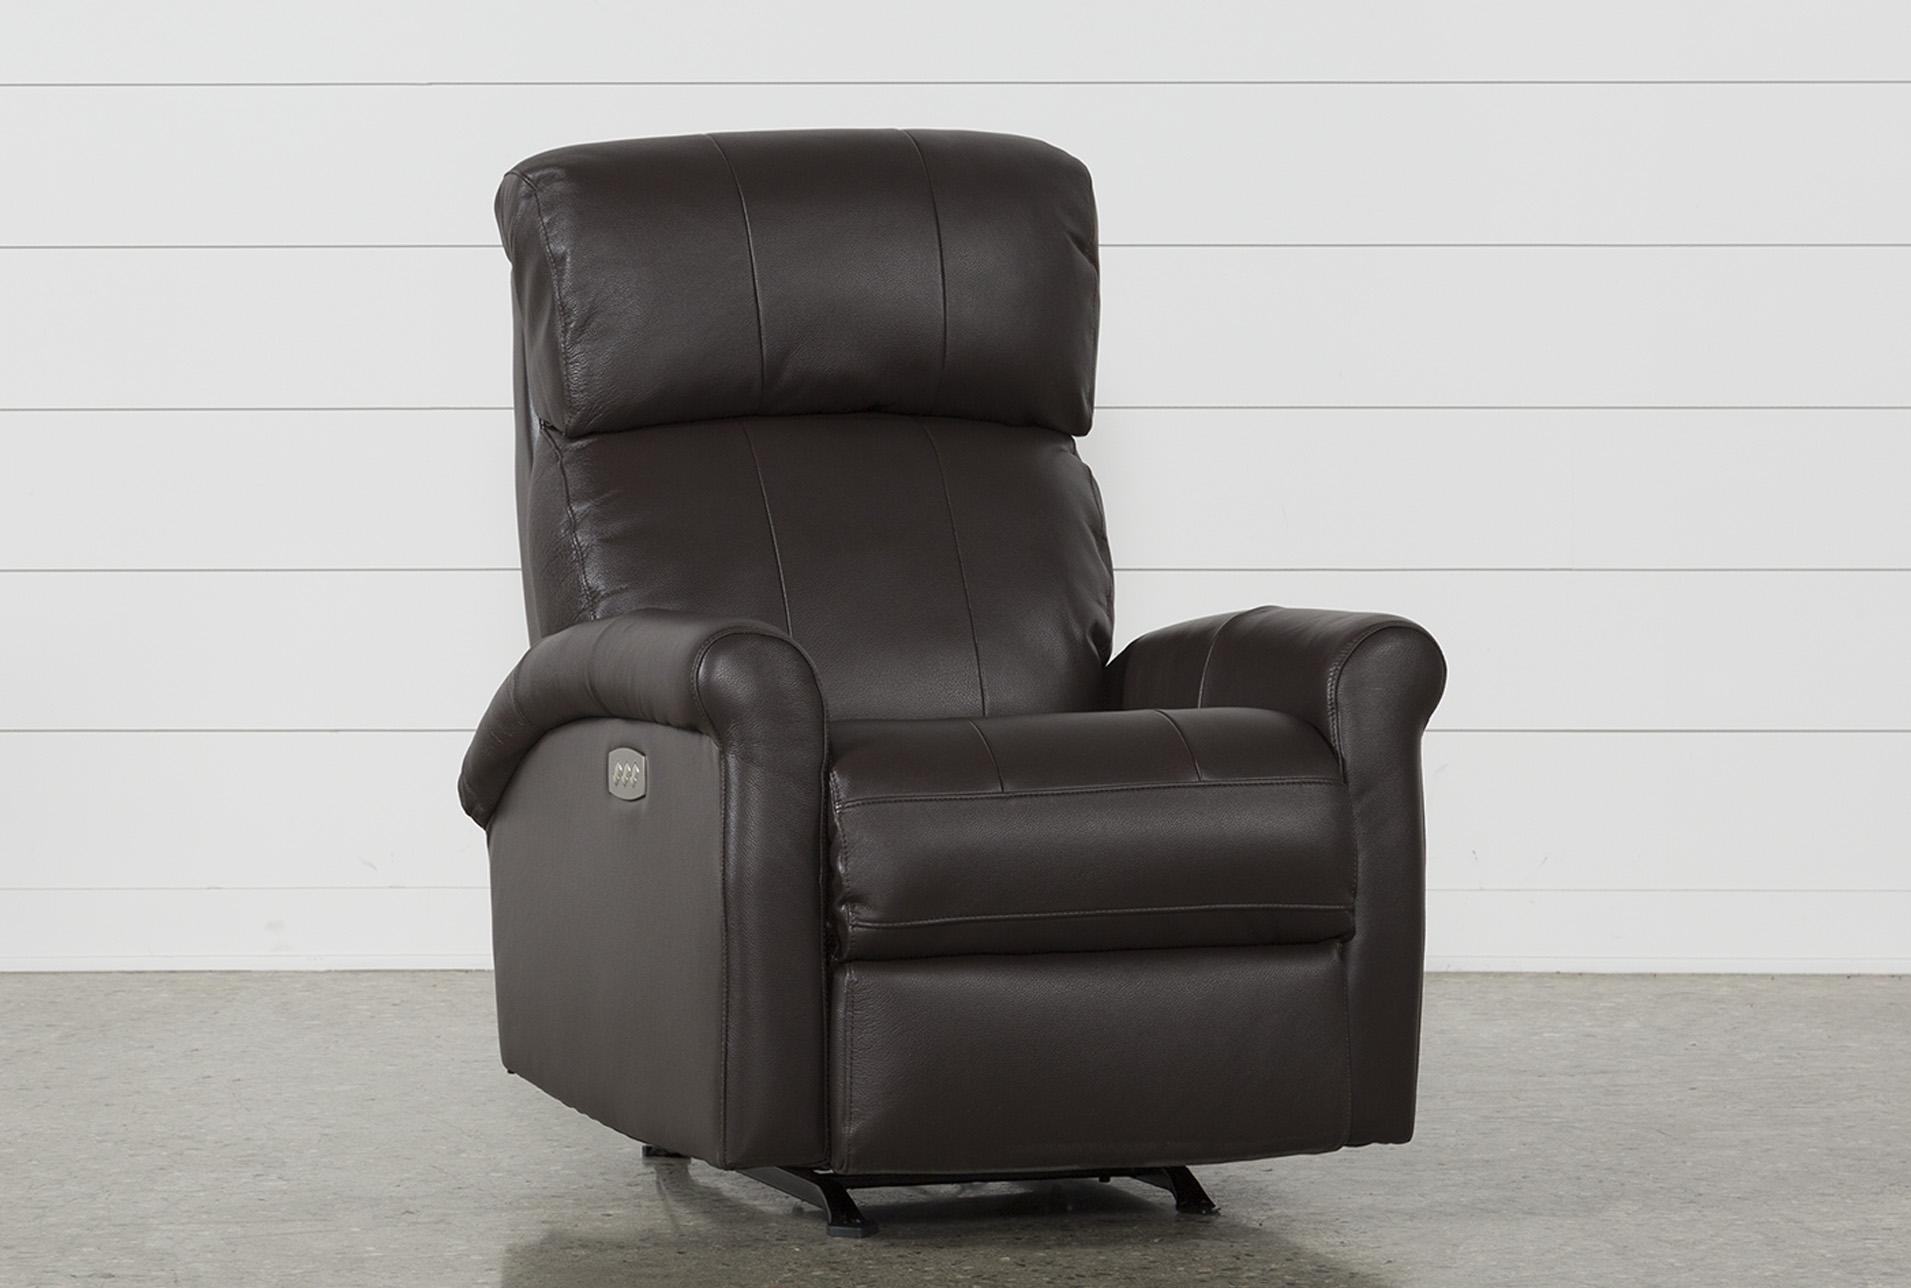 Dev Chocolate Power Recliner W/Pwr Headrest U0026 Lumbar